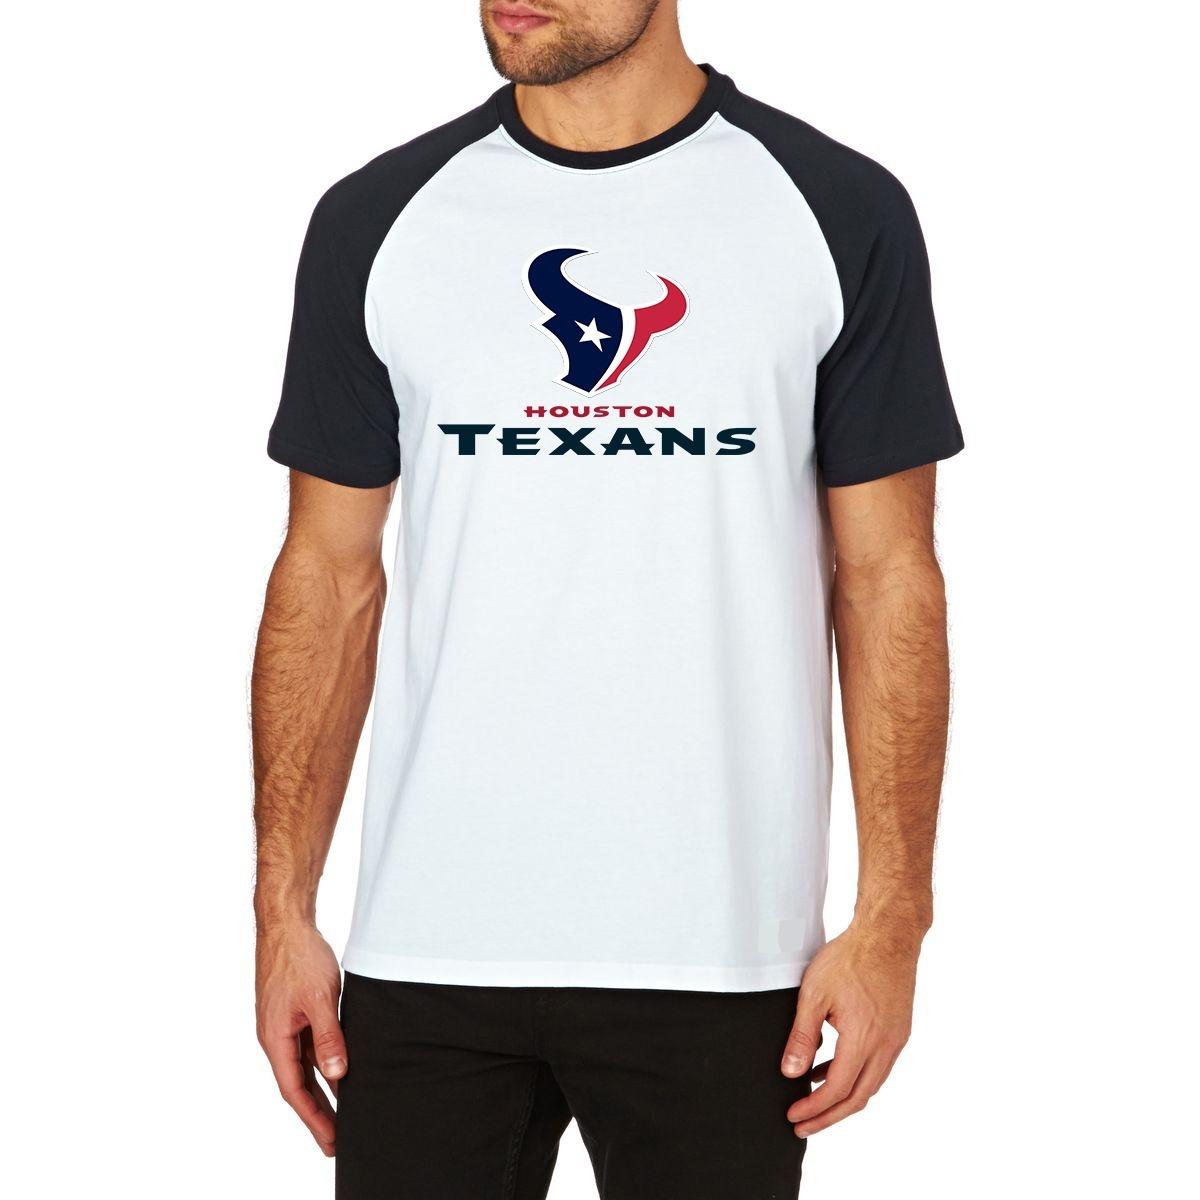 0223e0b05ee59 camiseta houston texans raglan futebol americano nfl m01. Carregando zoom.